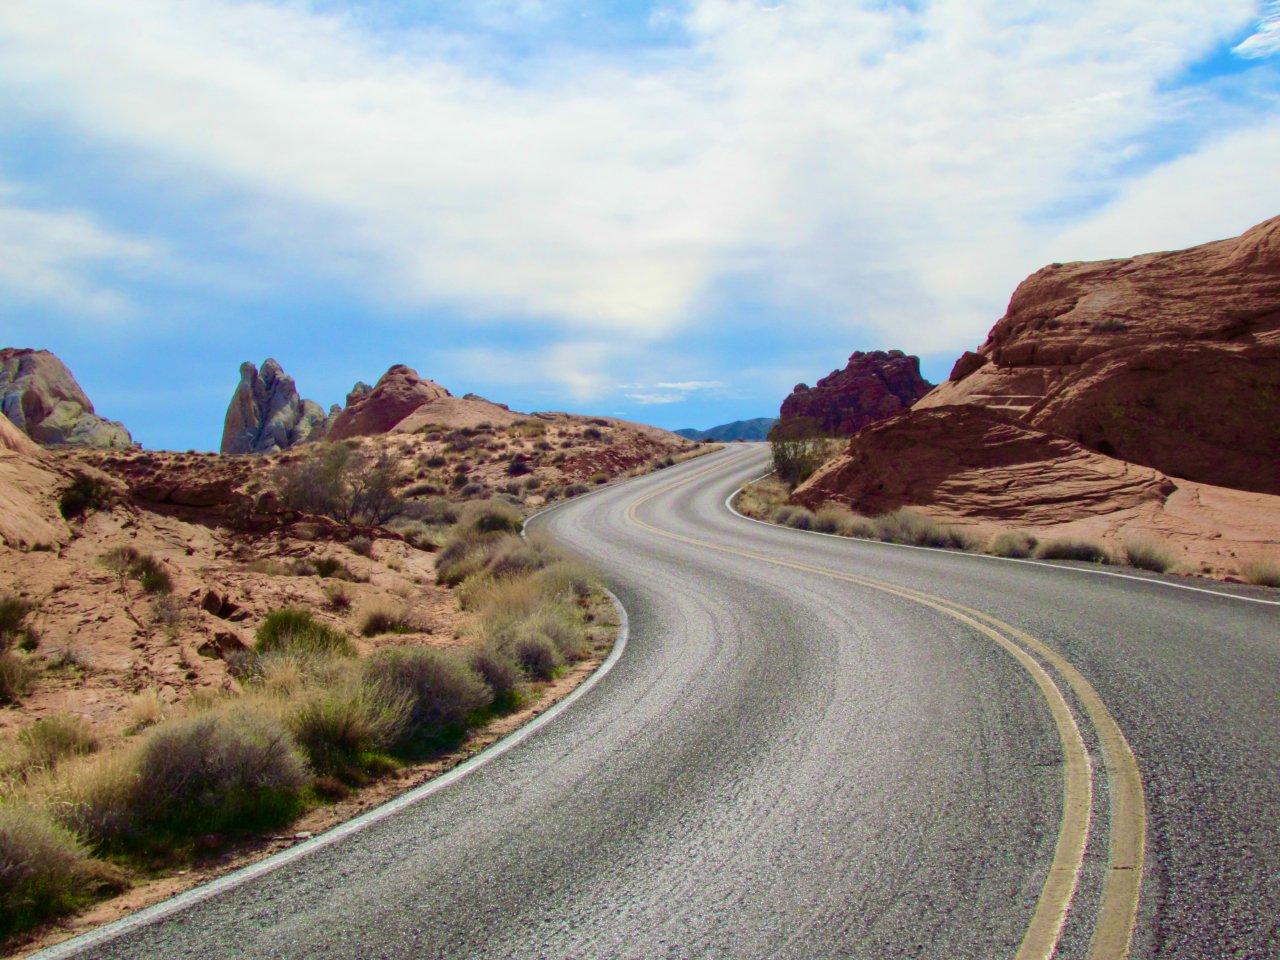 roads, Leaving Las Vegas for a delightful drive, ClassicCars.com Journal